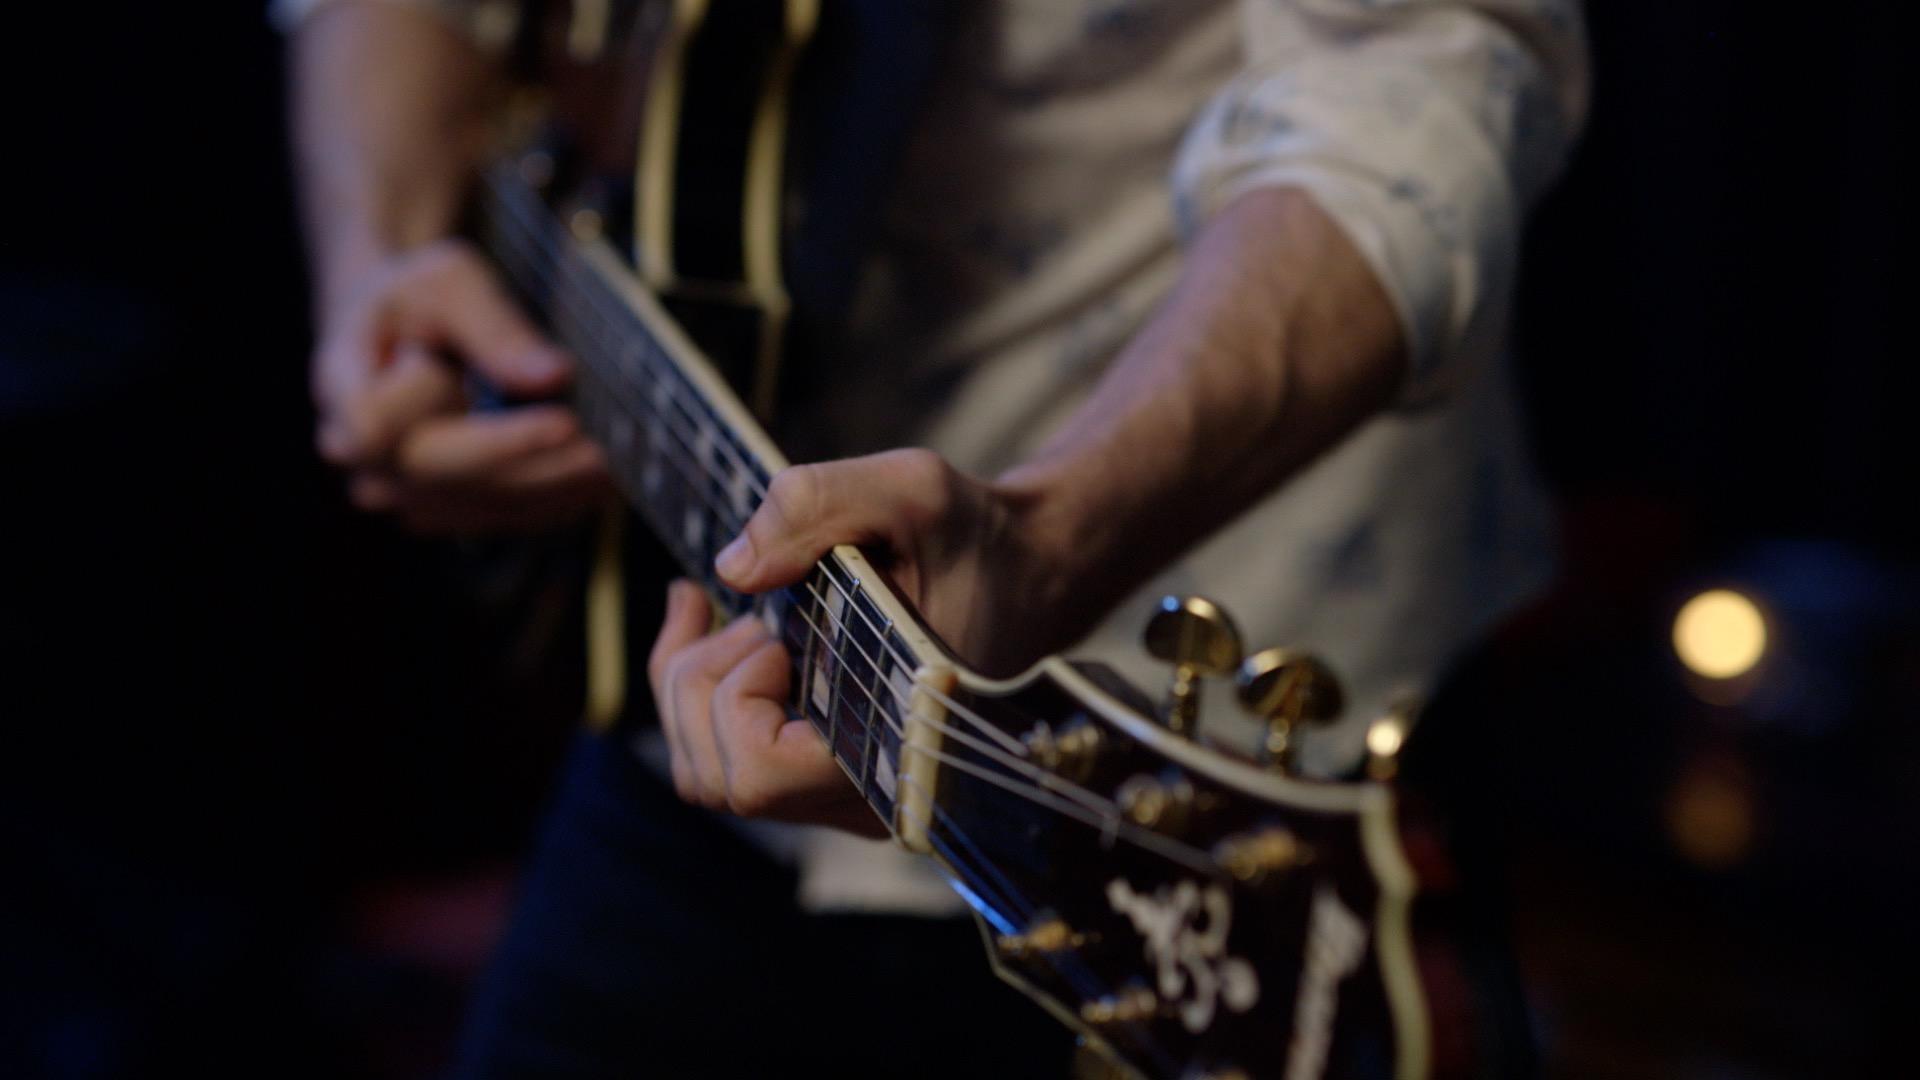 dox-video-production-austin-work-israel-nash-guitar.jpg